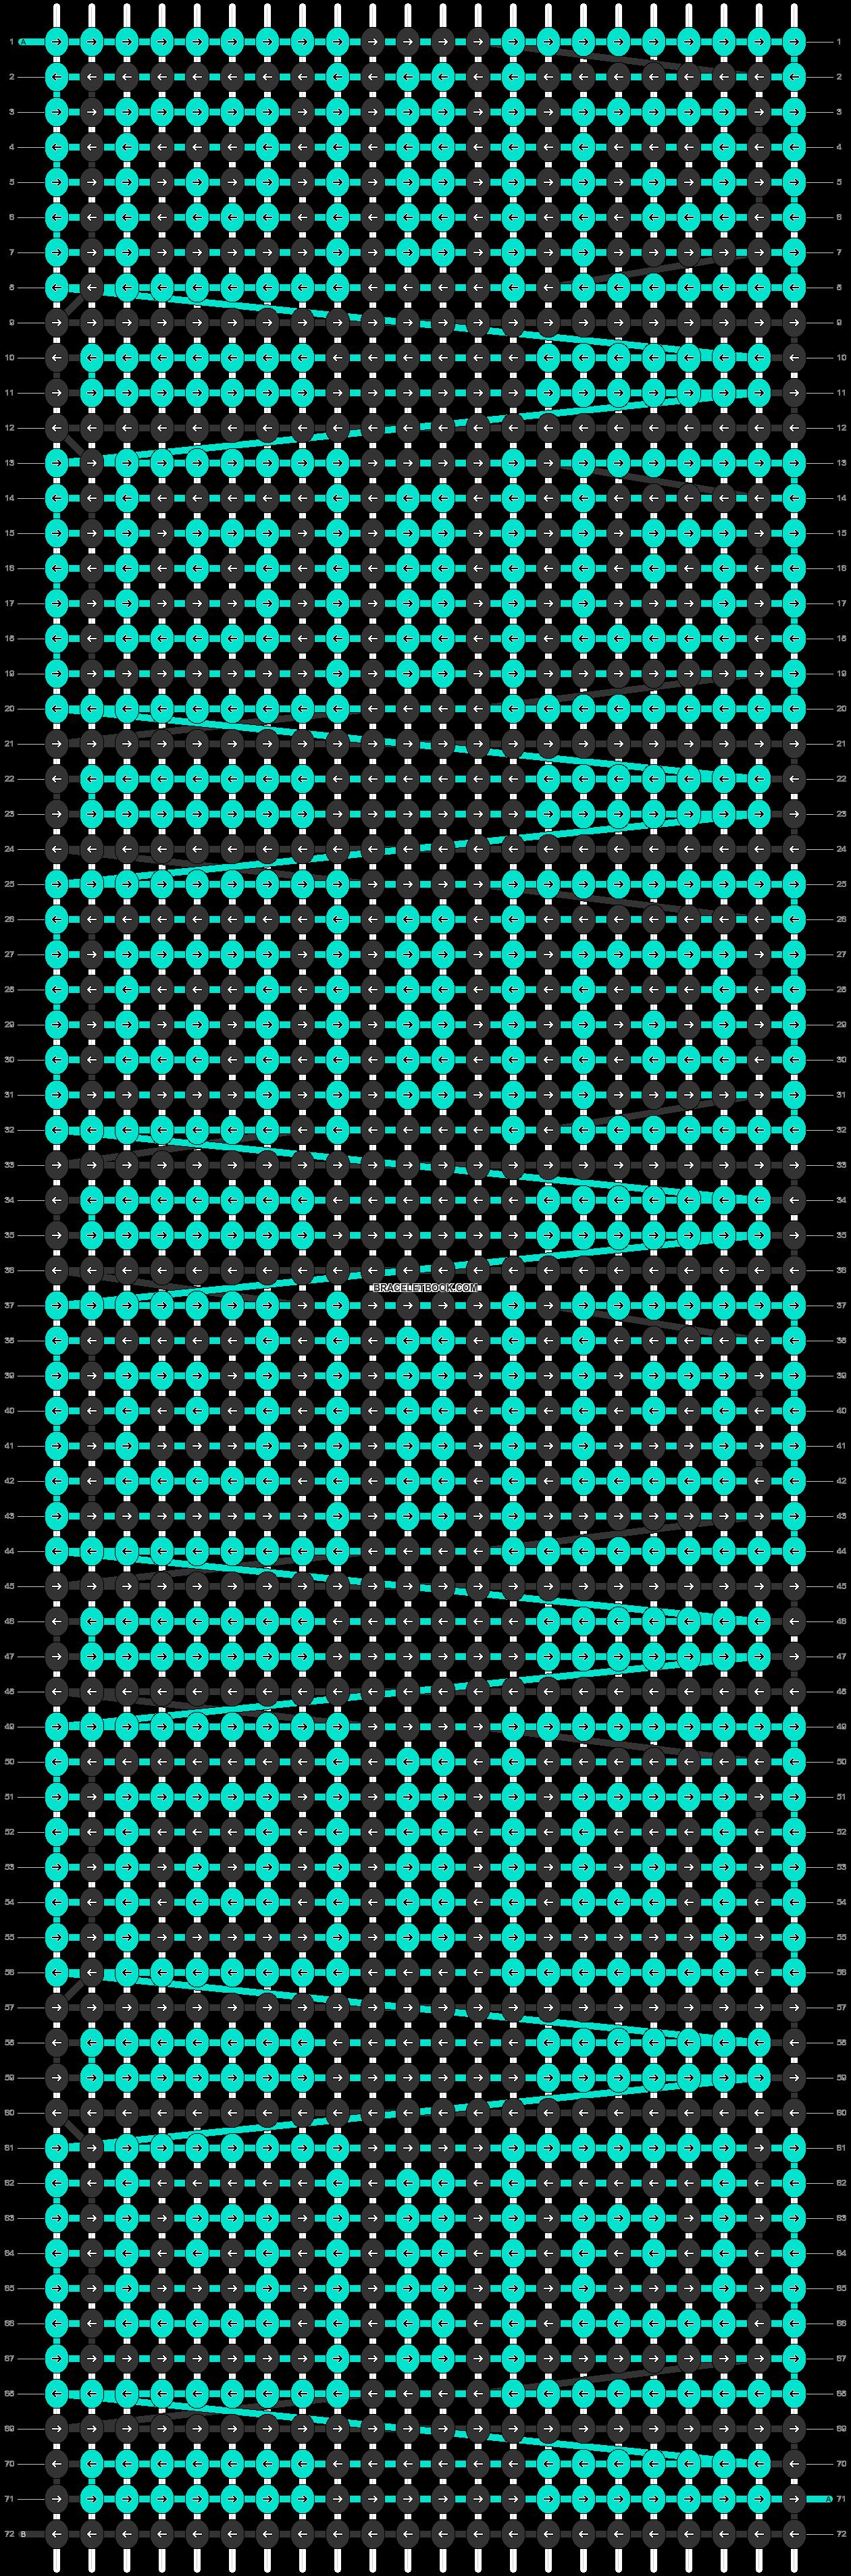 Pin On Bead Grid